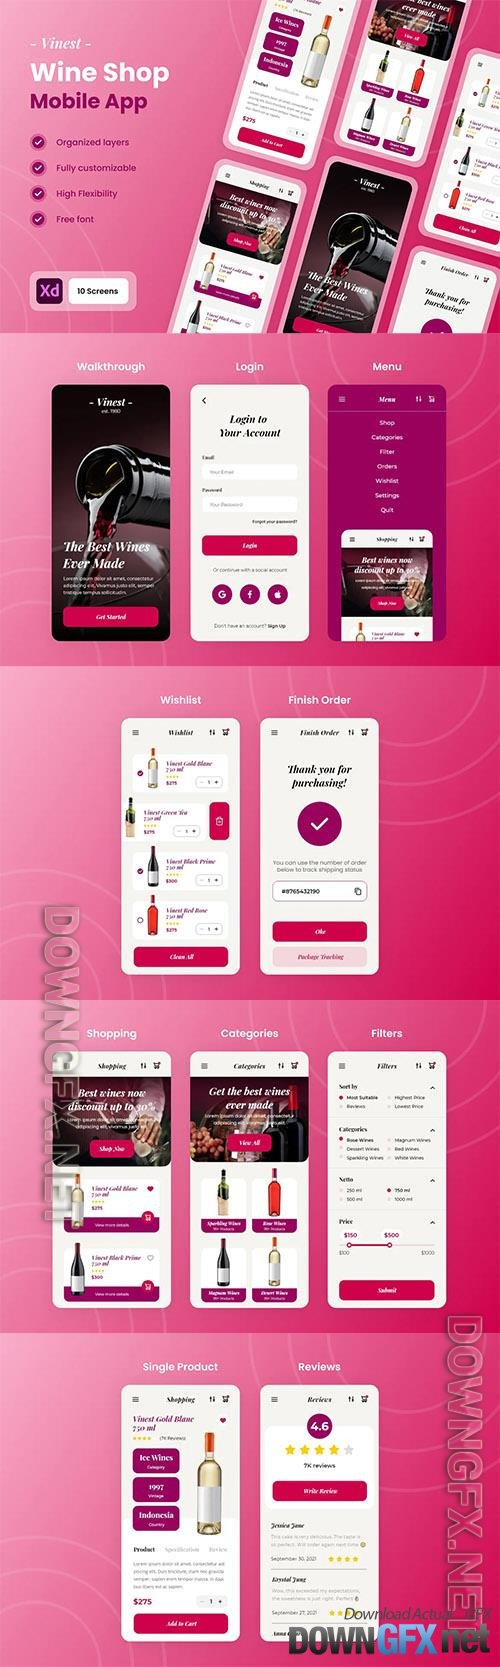 Vinest - Wine & Vineyard Mobile App UI Kit